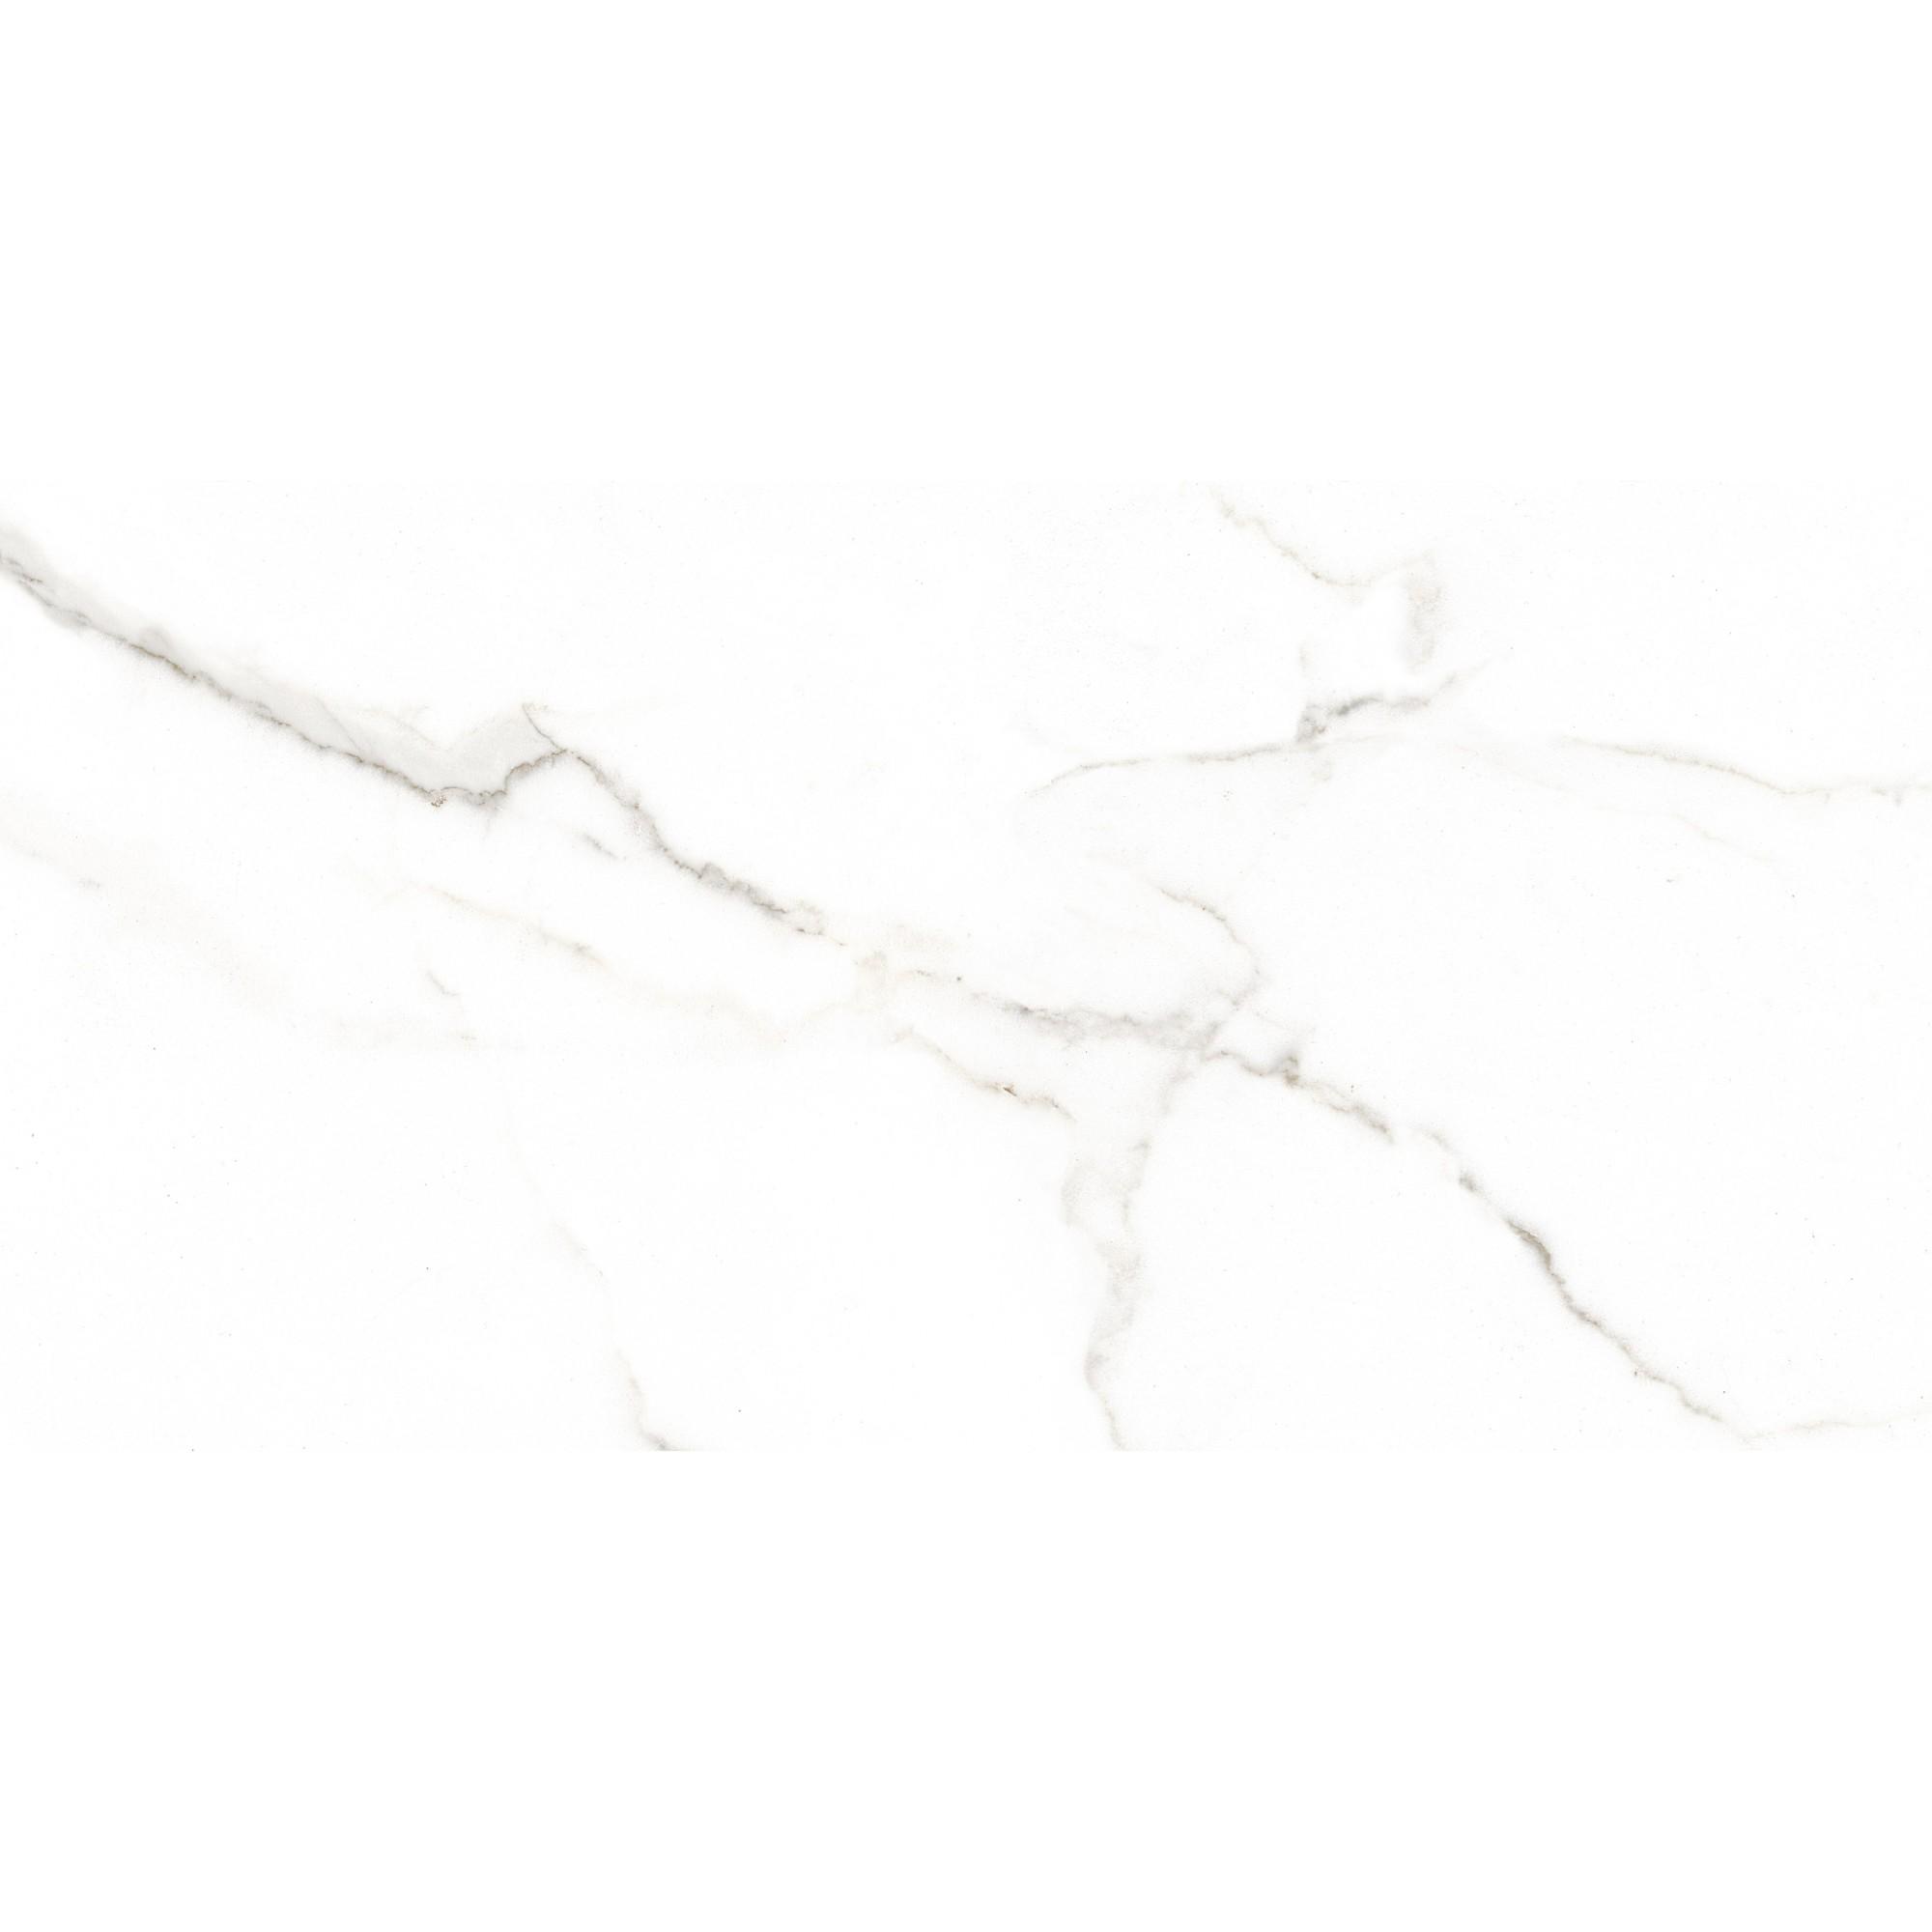 Revestimento Tipo A 38x75 cm Esmaltado Brilhante Selah White 200m - Carmelo Fior